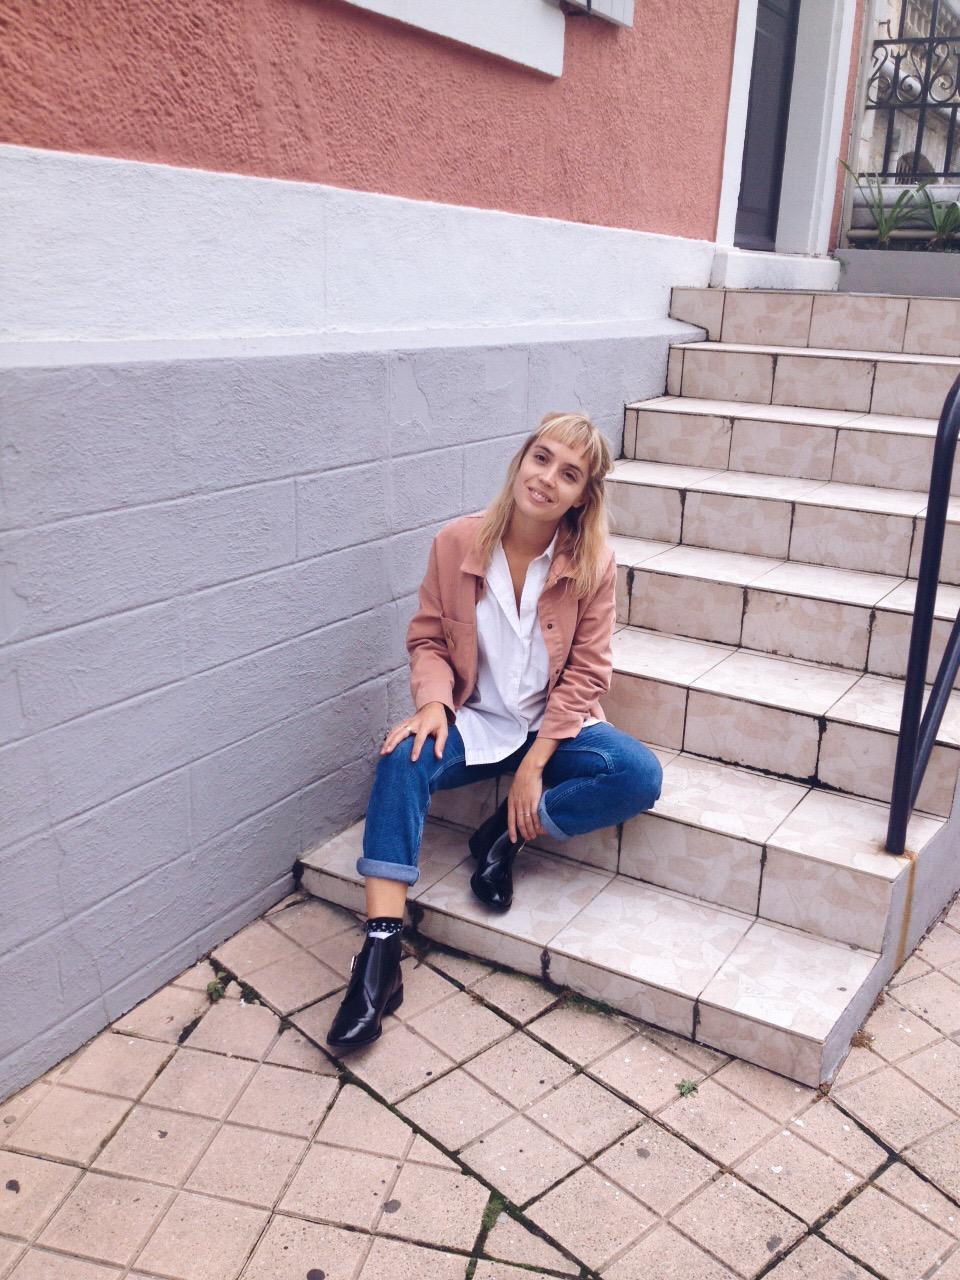 veste-en-jean-rose-chemise-oversize-jean-et-bottines-noires